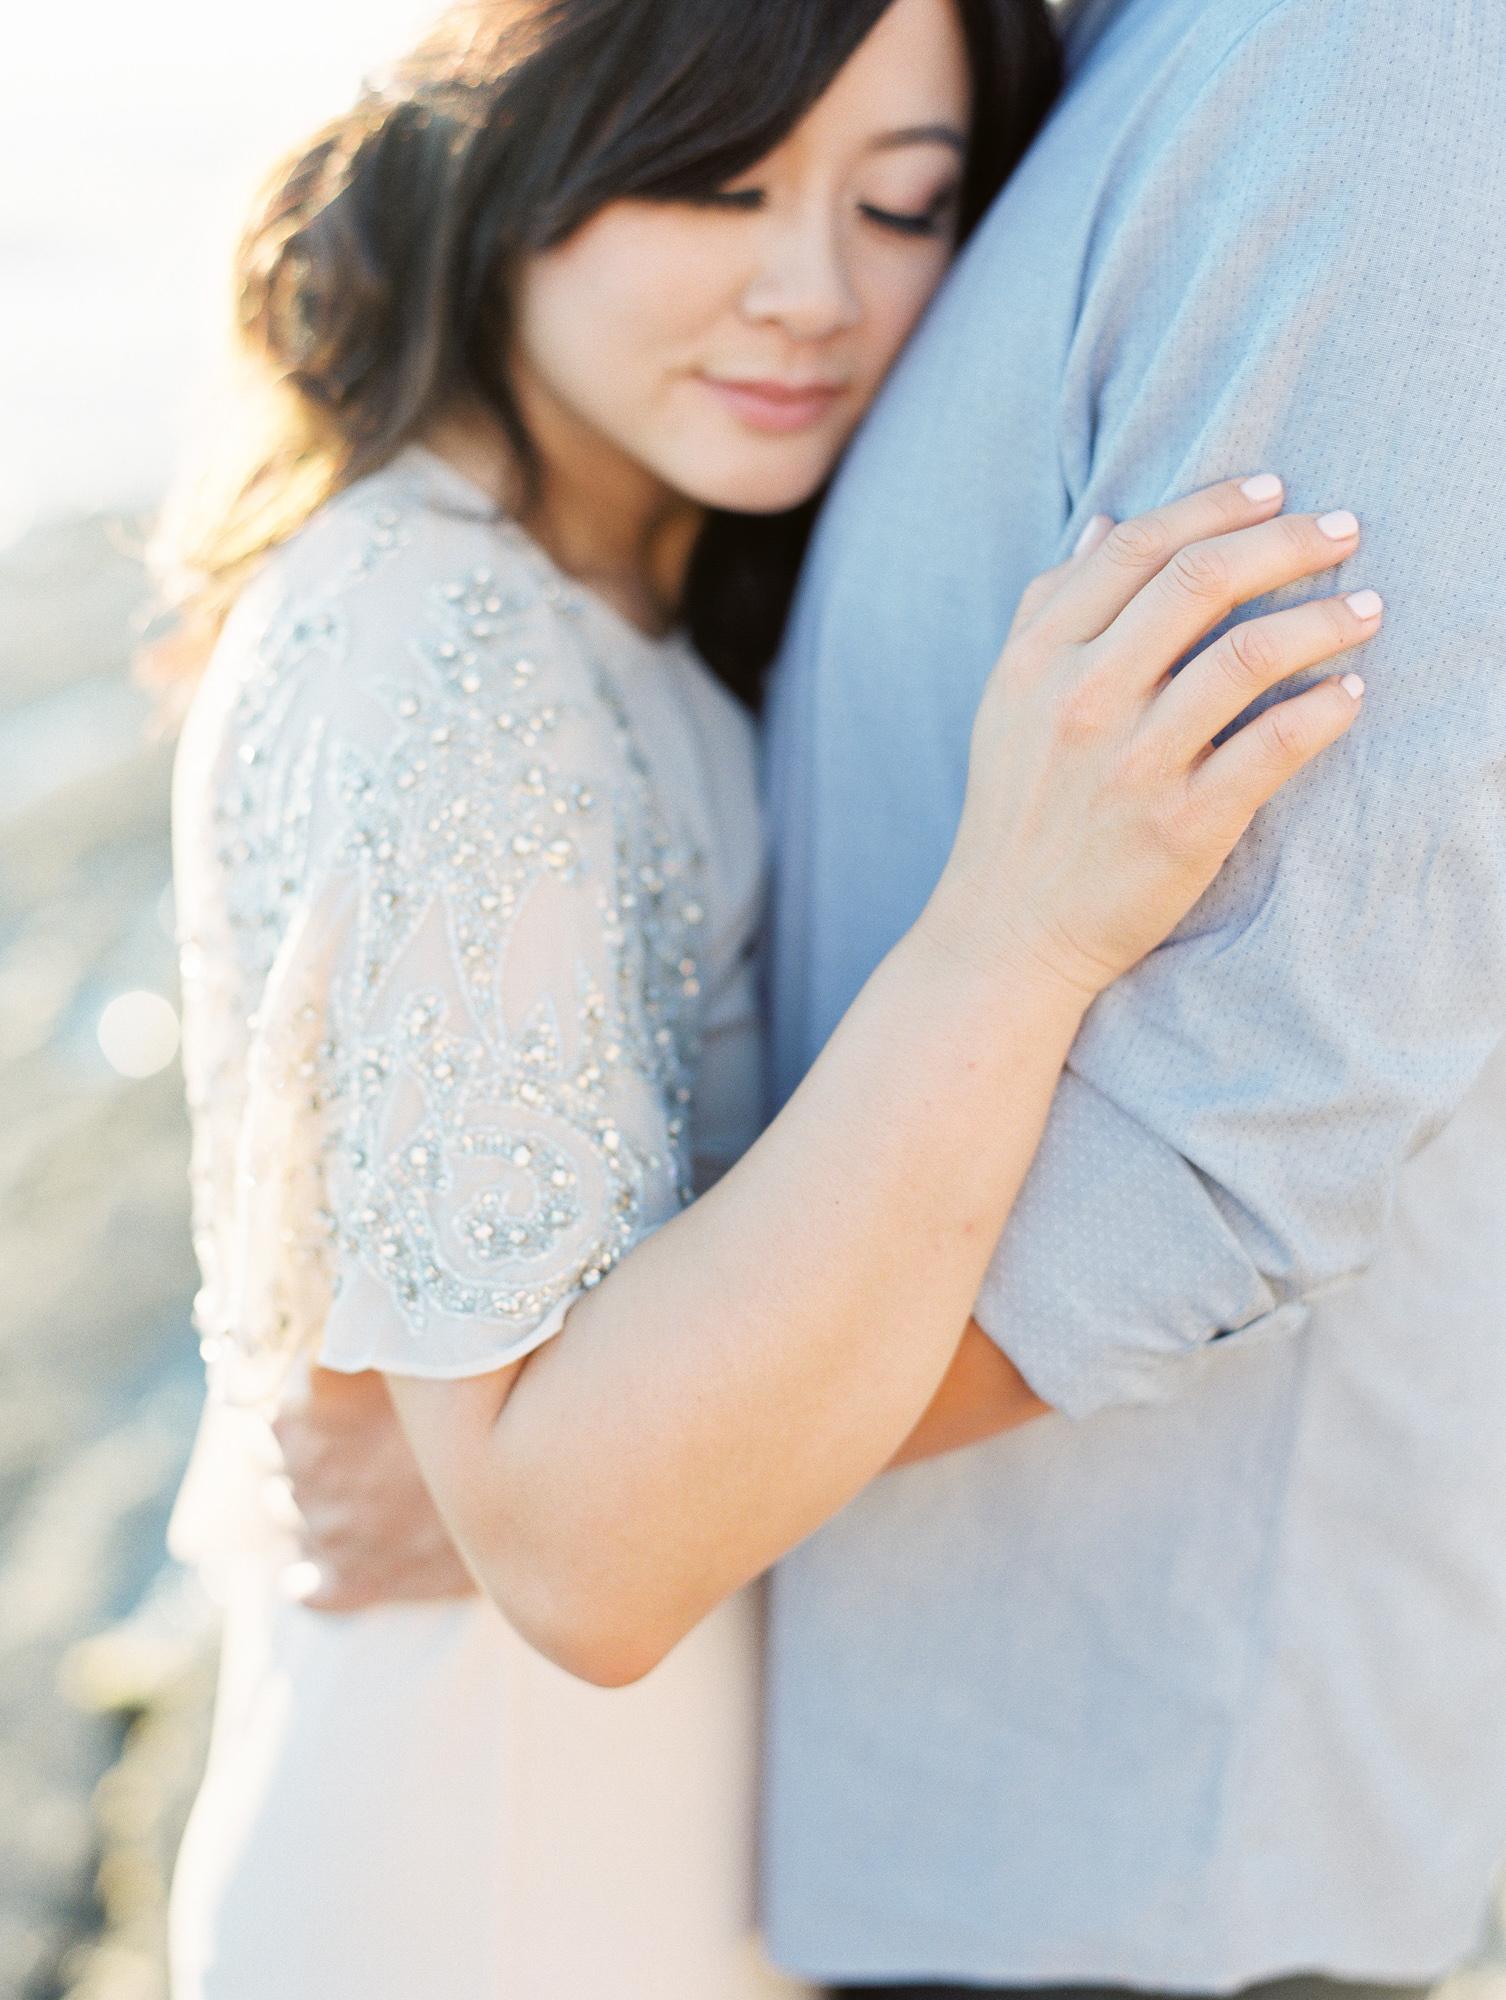 Crystal-Cove-Engagement-Kristina-Adams-16.jpg